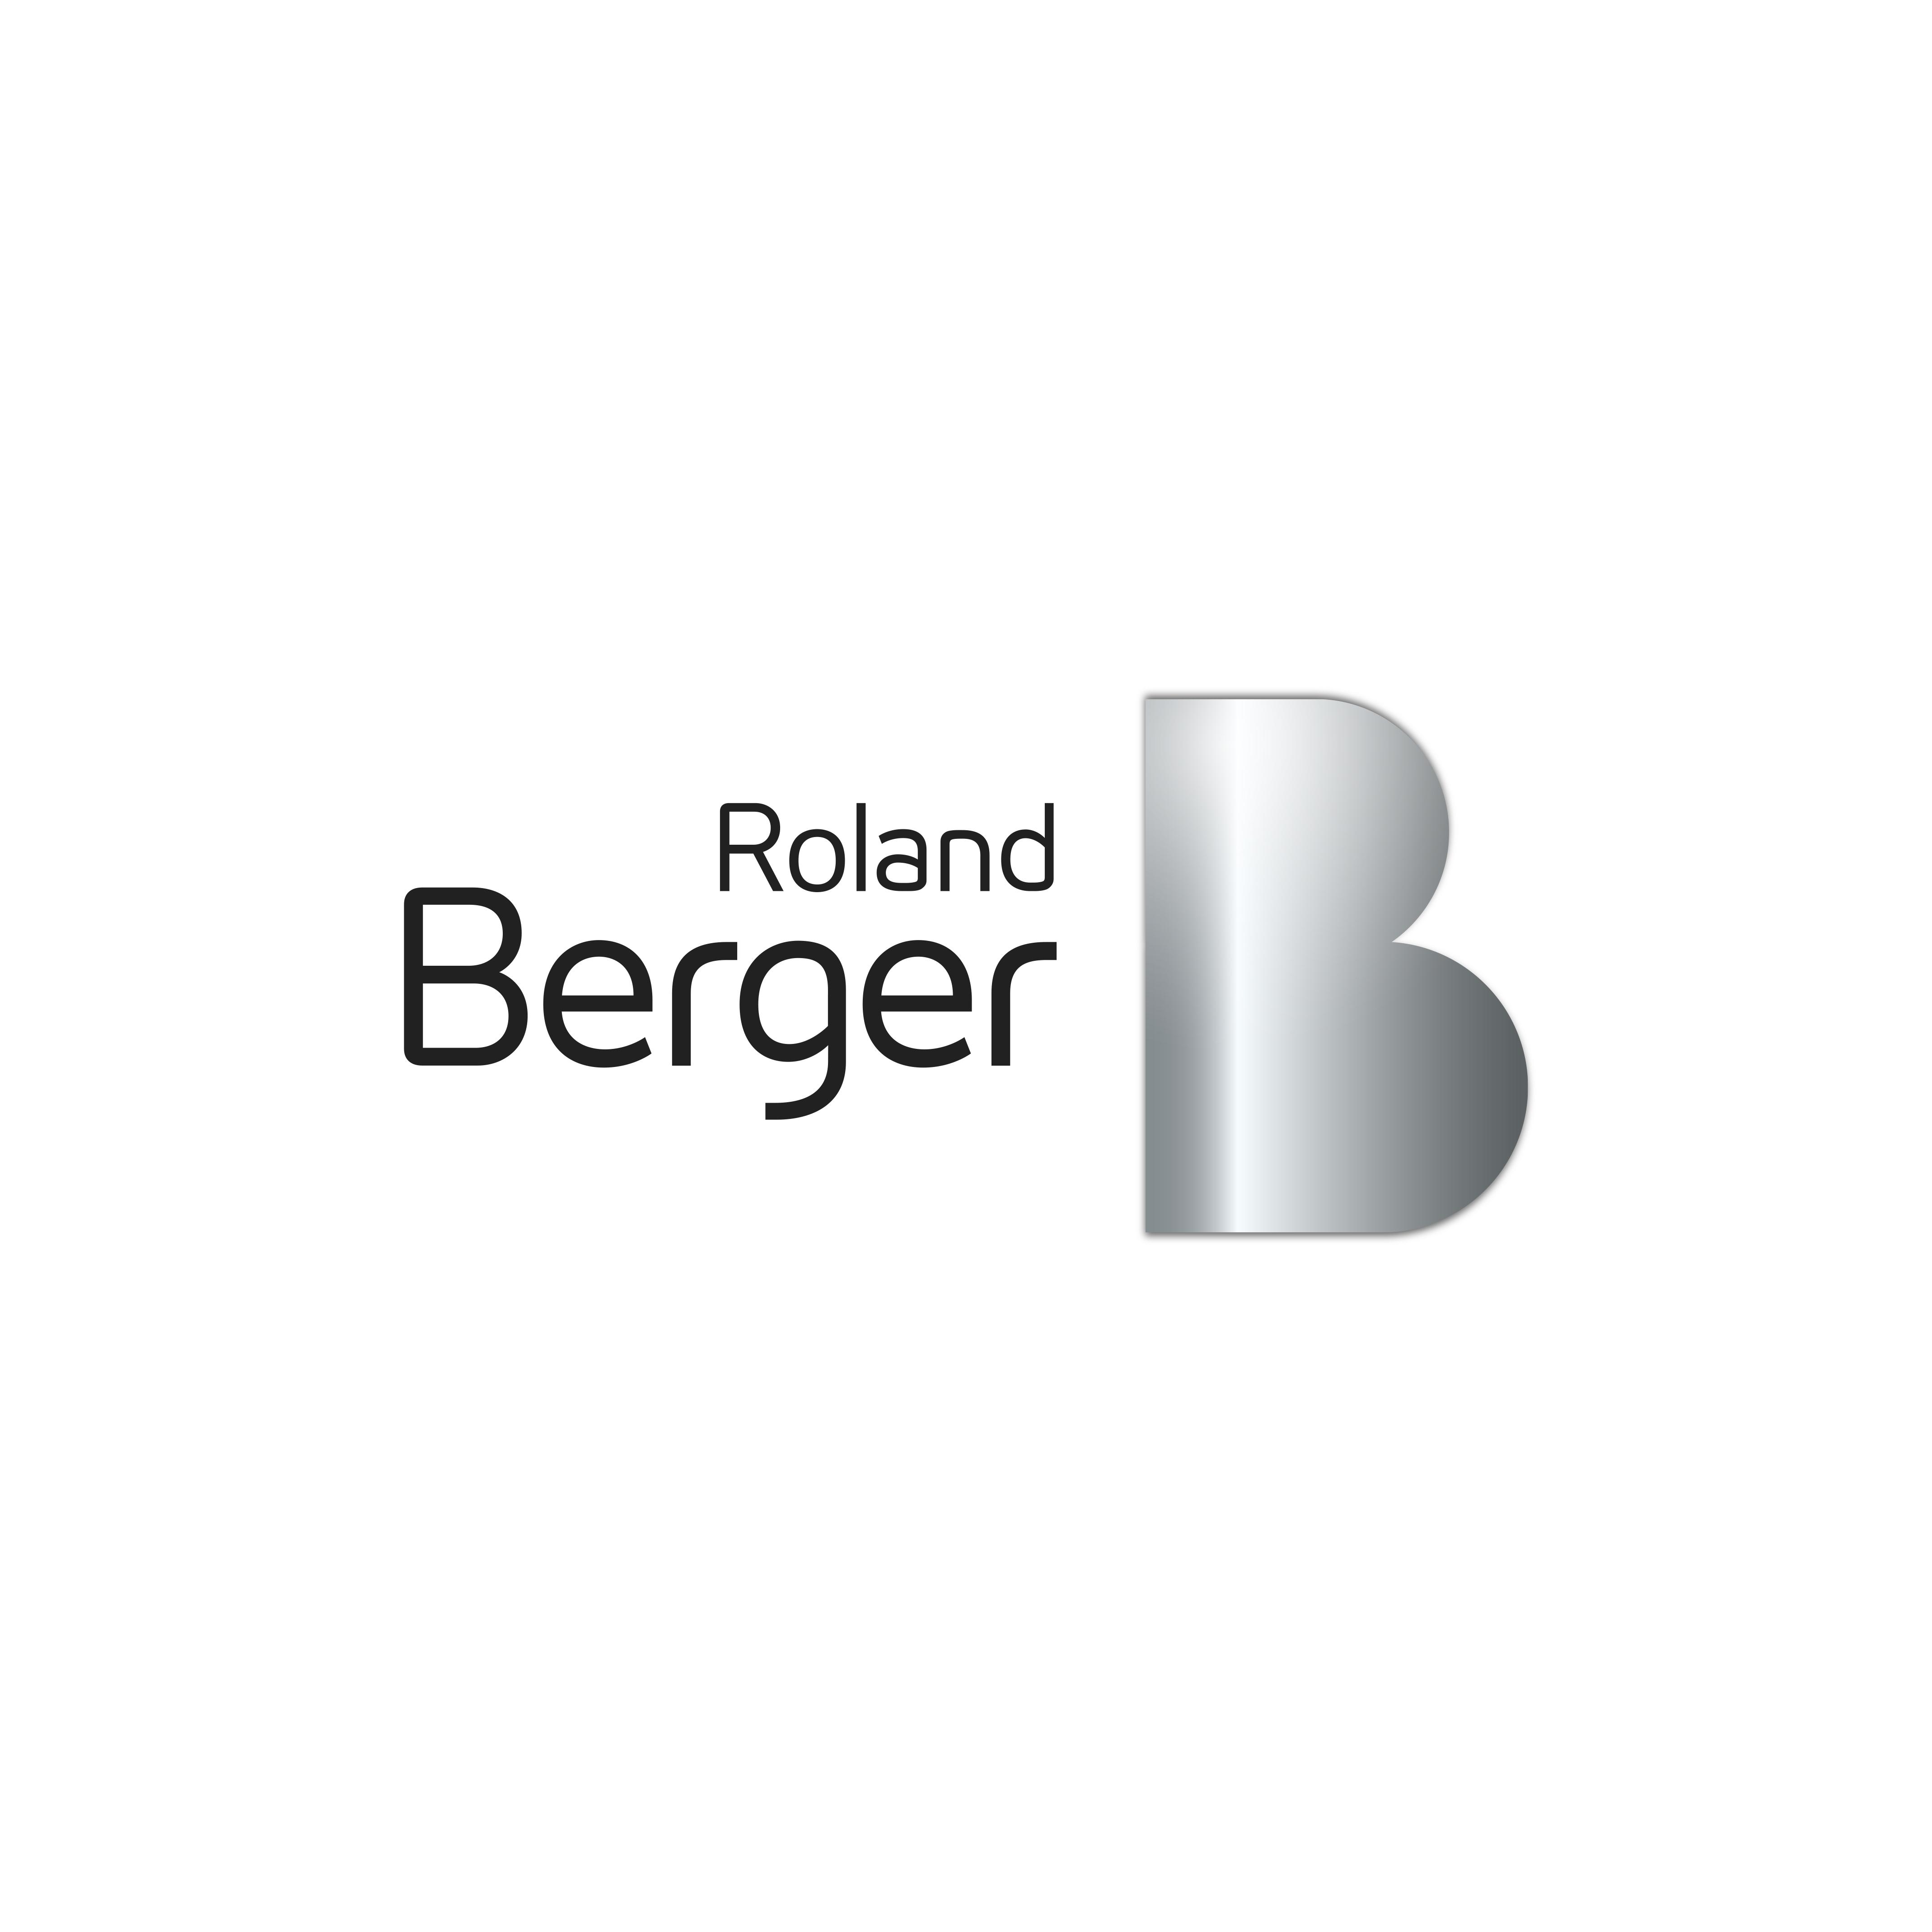 Roland Berger Budapest